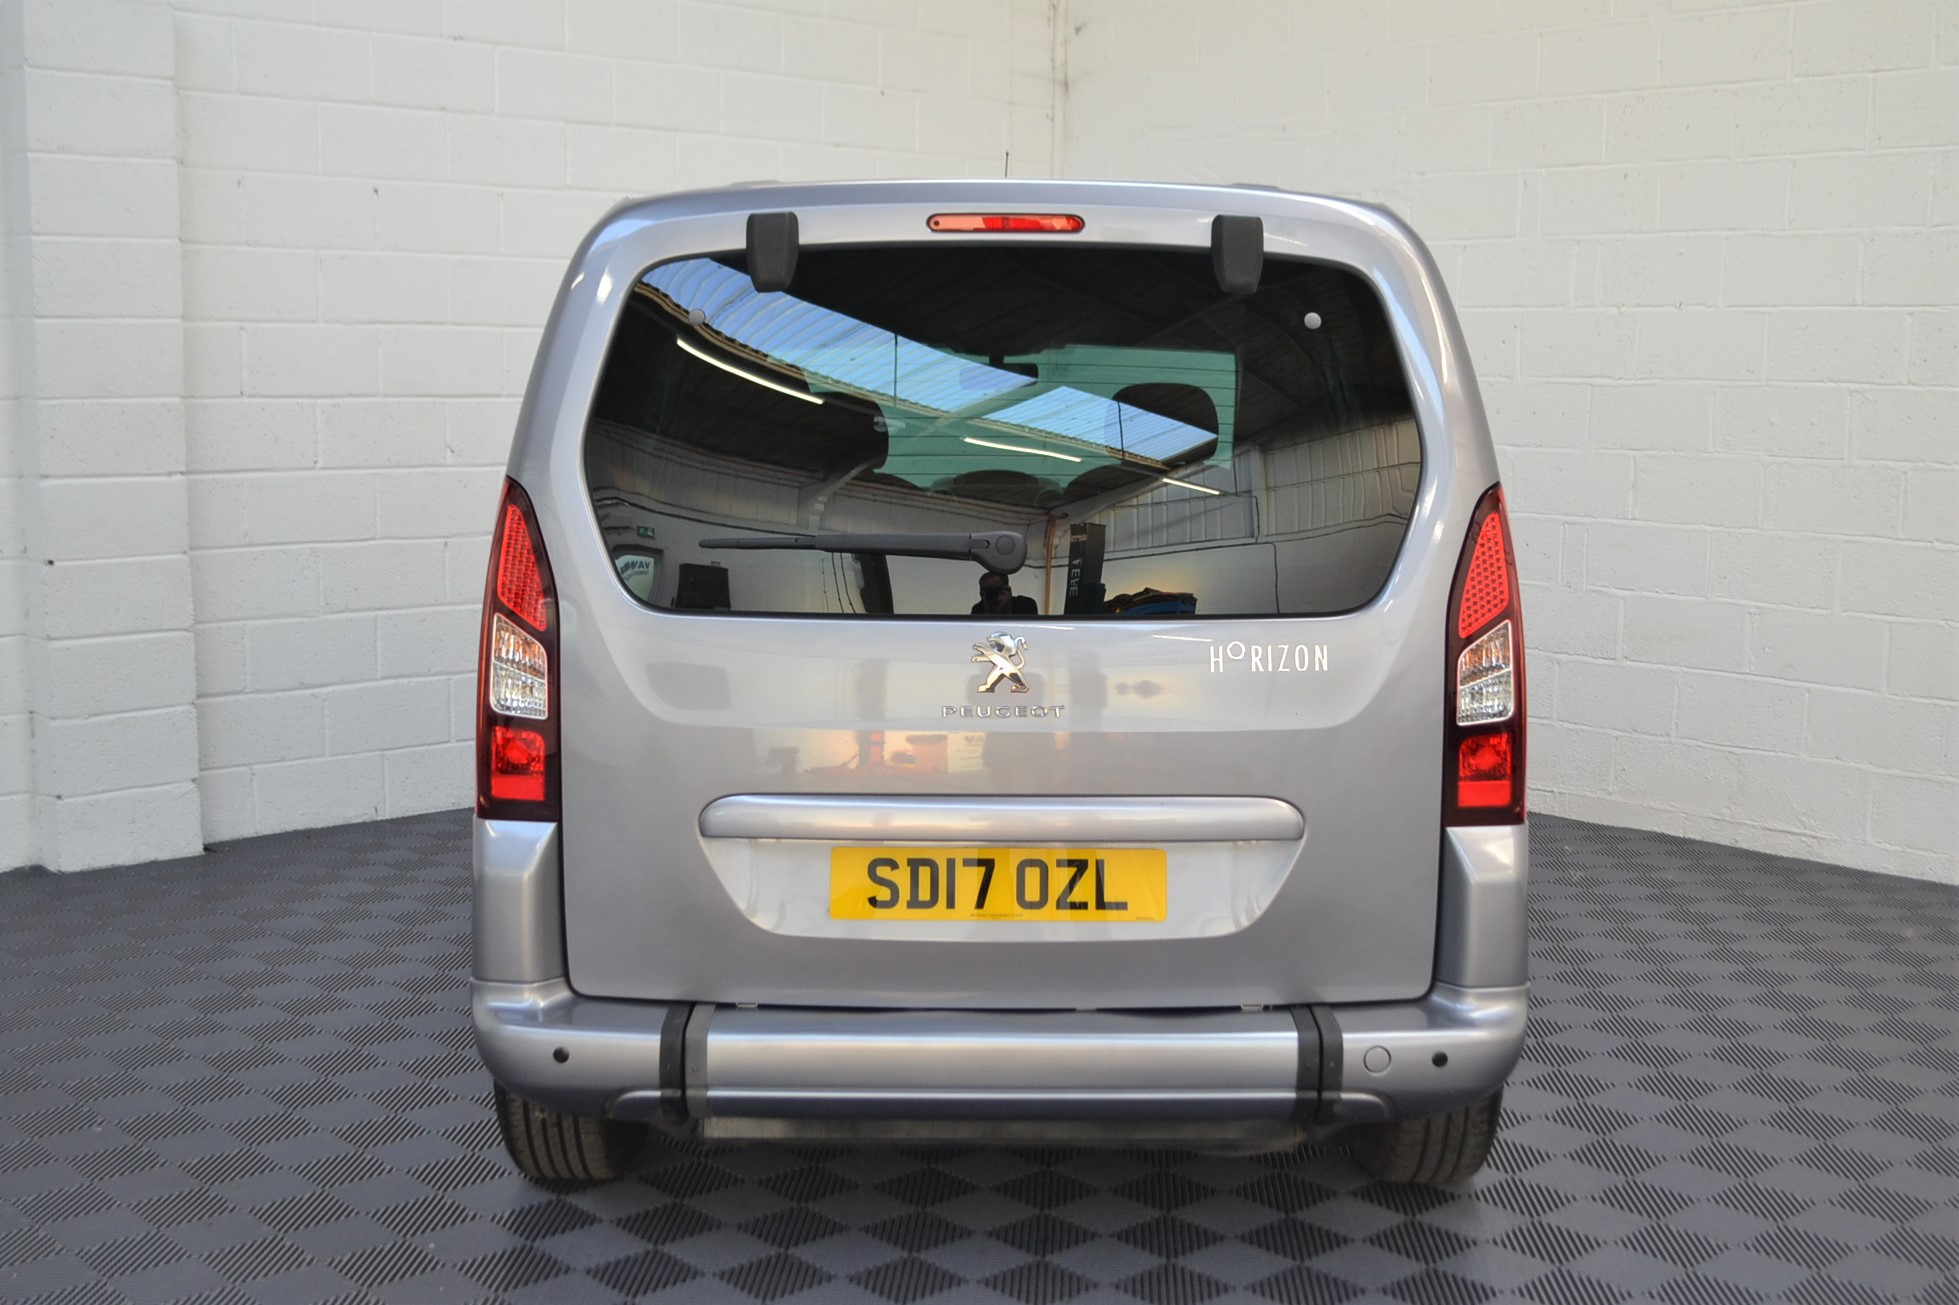 WAV Cars For Sale Bristol Wheelchair Accessible Vehicles Used For Sale Somerset Devon Dorset Bath Peugeot Partner SD17 OZL 4